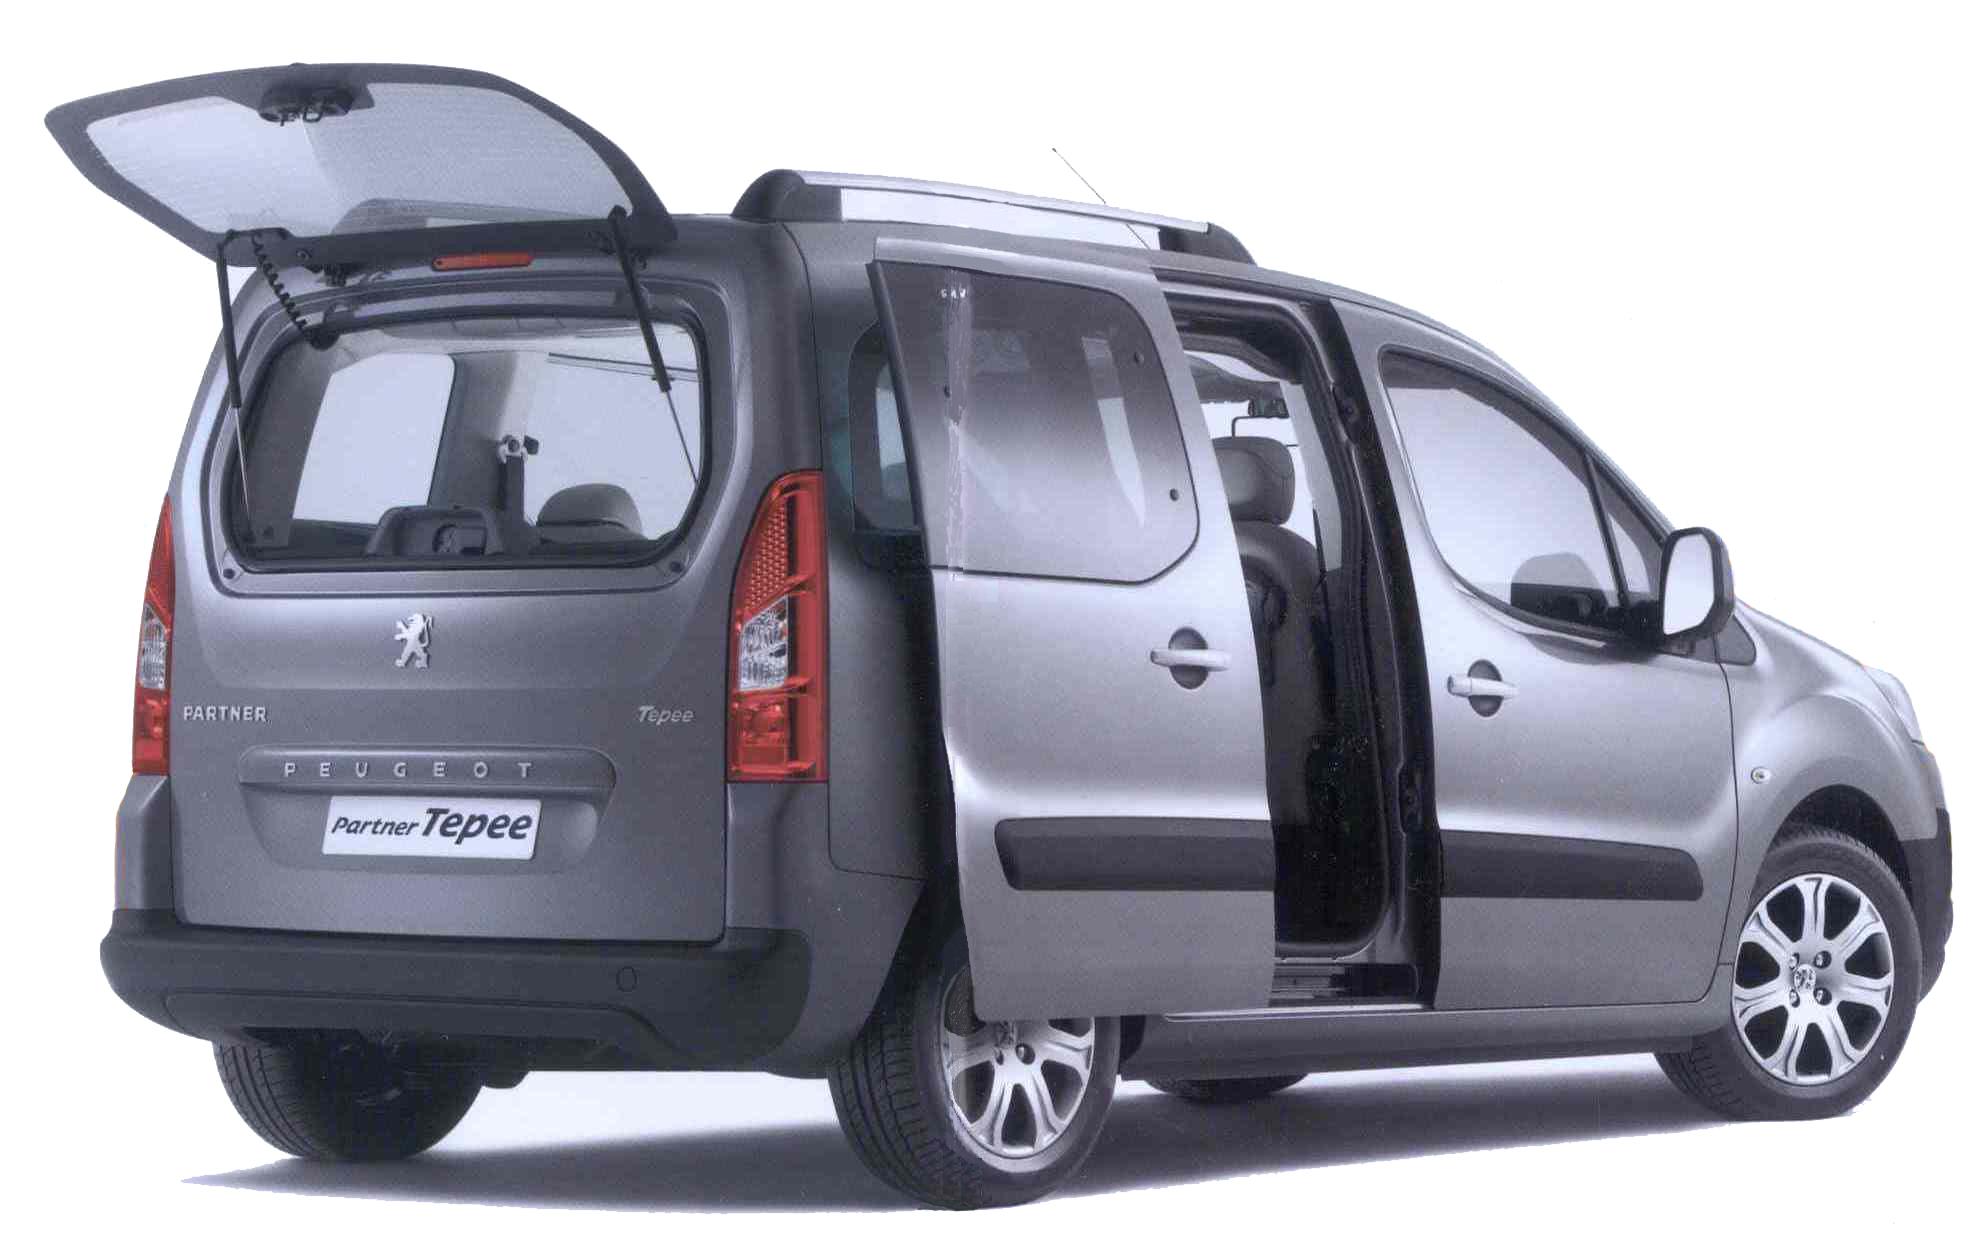 peugeot partner picture 15 reviews news specs buy car. Black Bedroom Furniture Sets. Home Design Ideas